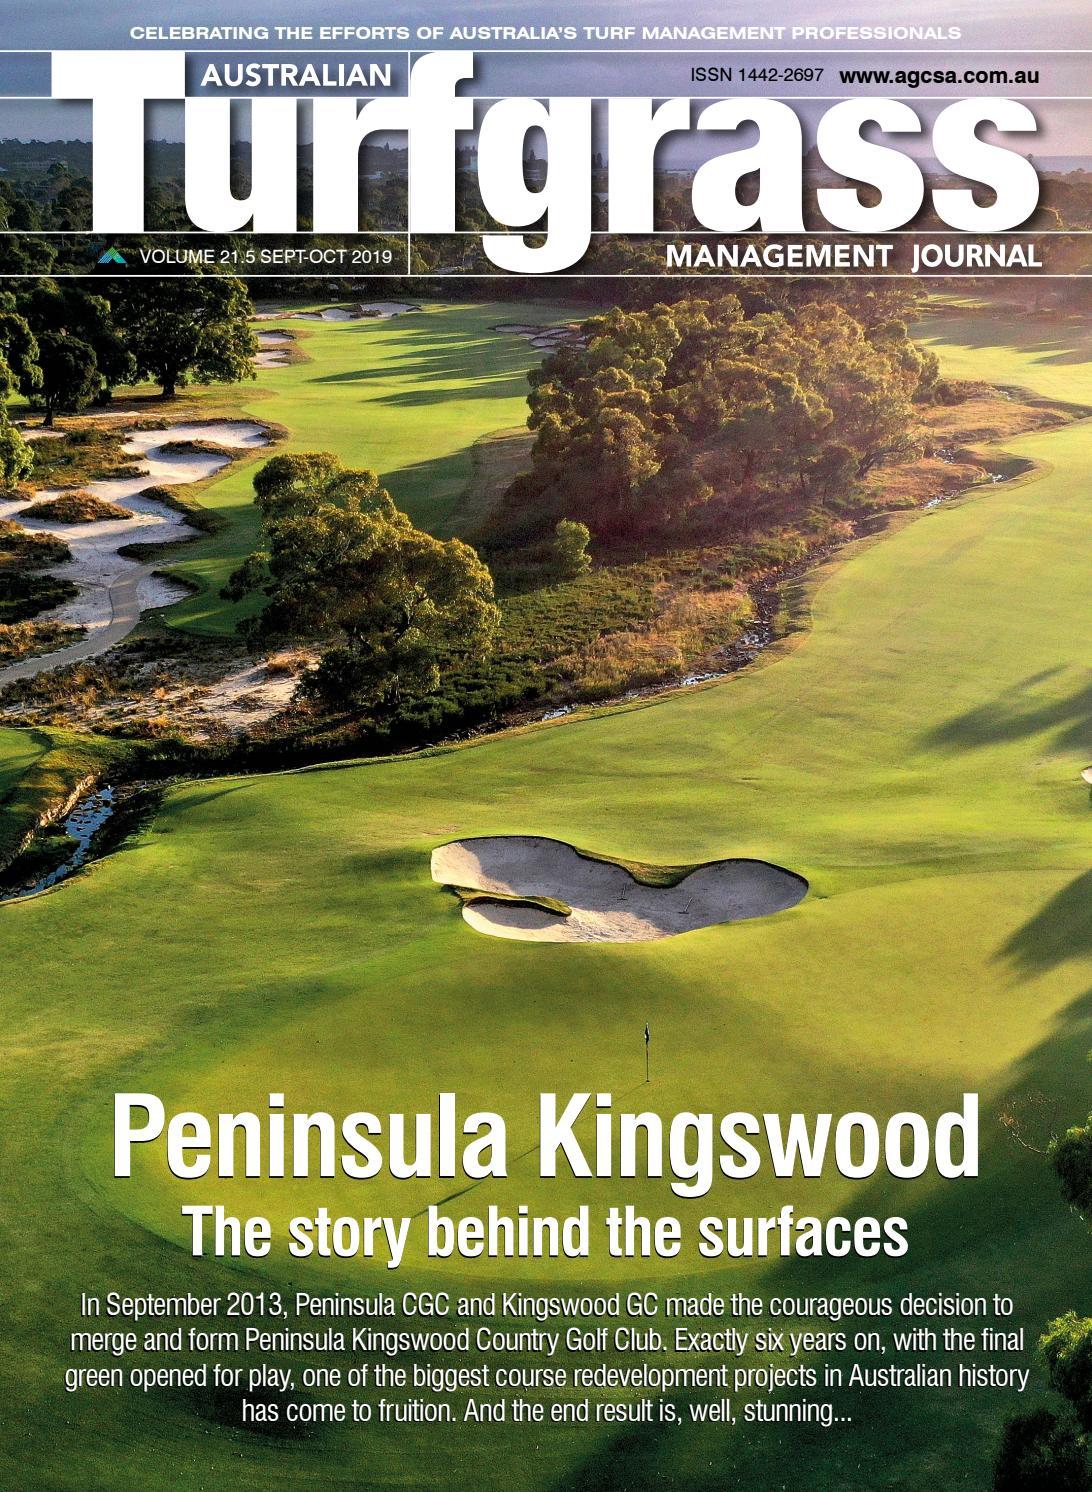 Australian Turfgrass Management Journal Volume 21 5 By Agcsa Issuu